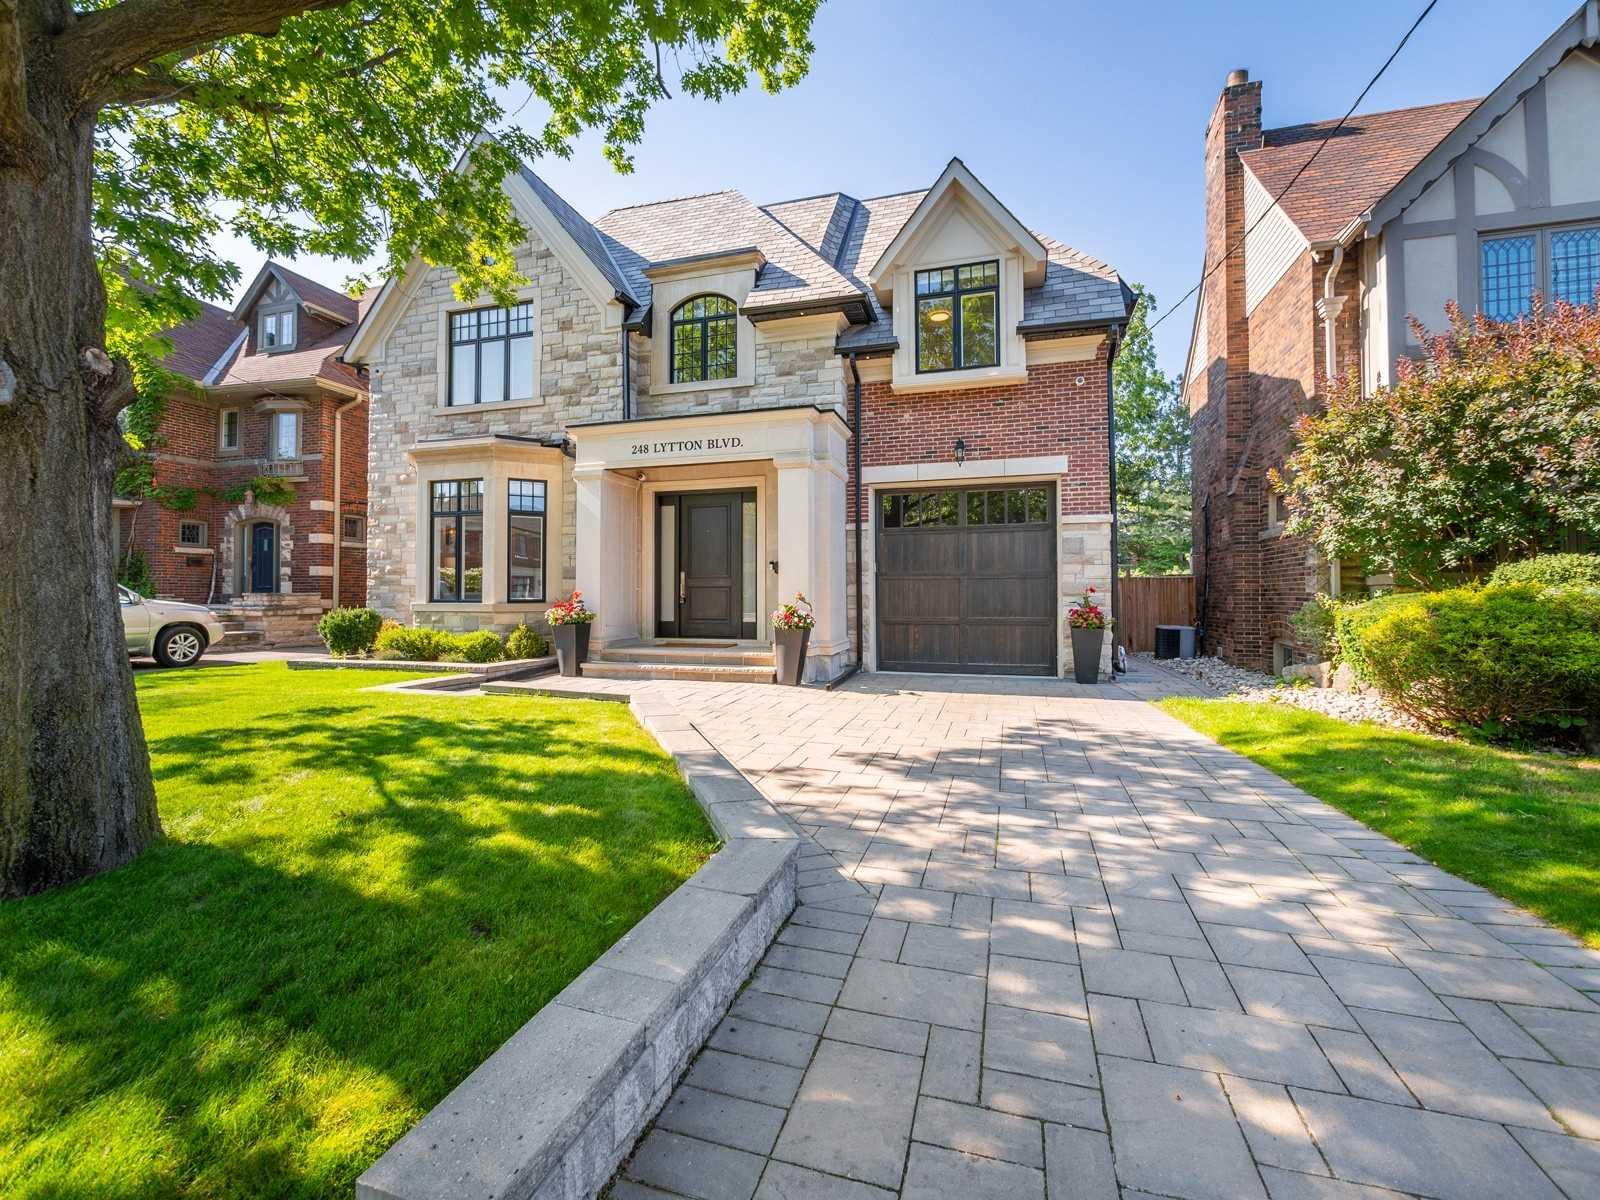 248 Lytton Blvd, Toronto, Ontario M5N1R6, 5 Bedrooms Bedrooms, 10 Rooms Rooms,5 BathroomsBathrooms,Detached,For Sale,Lytton,C5394454